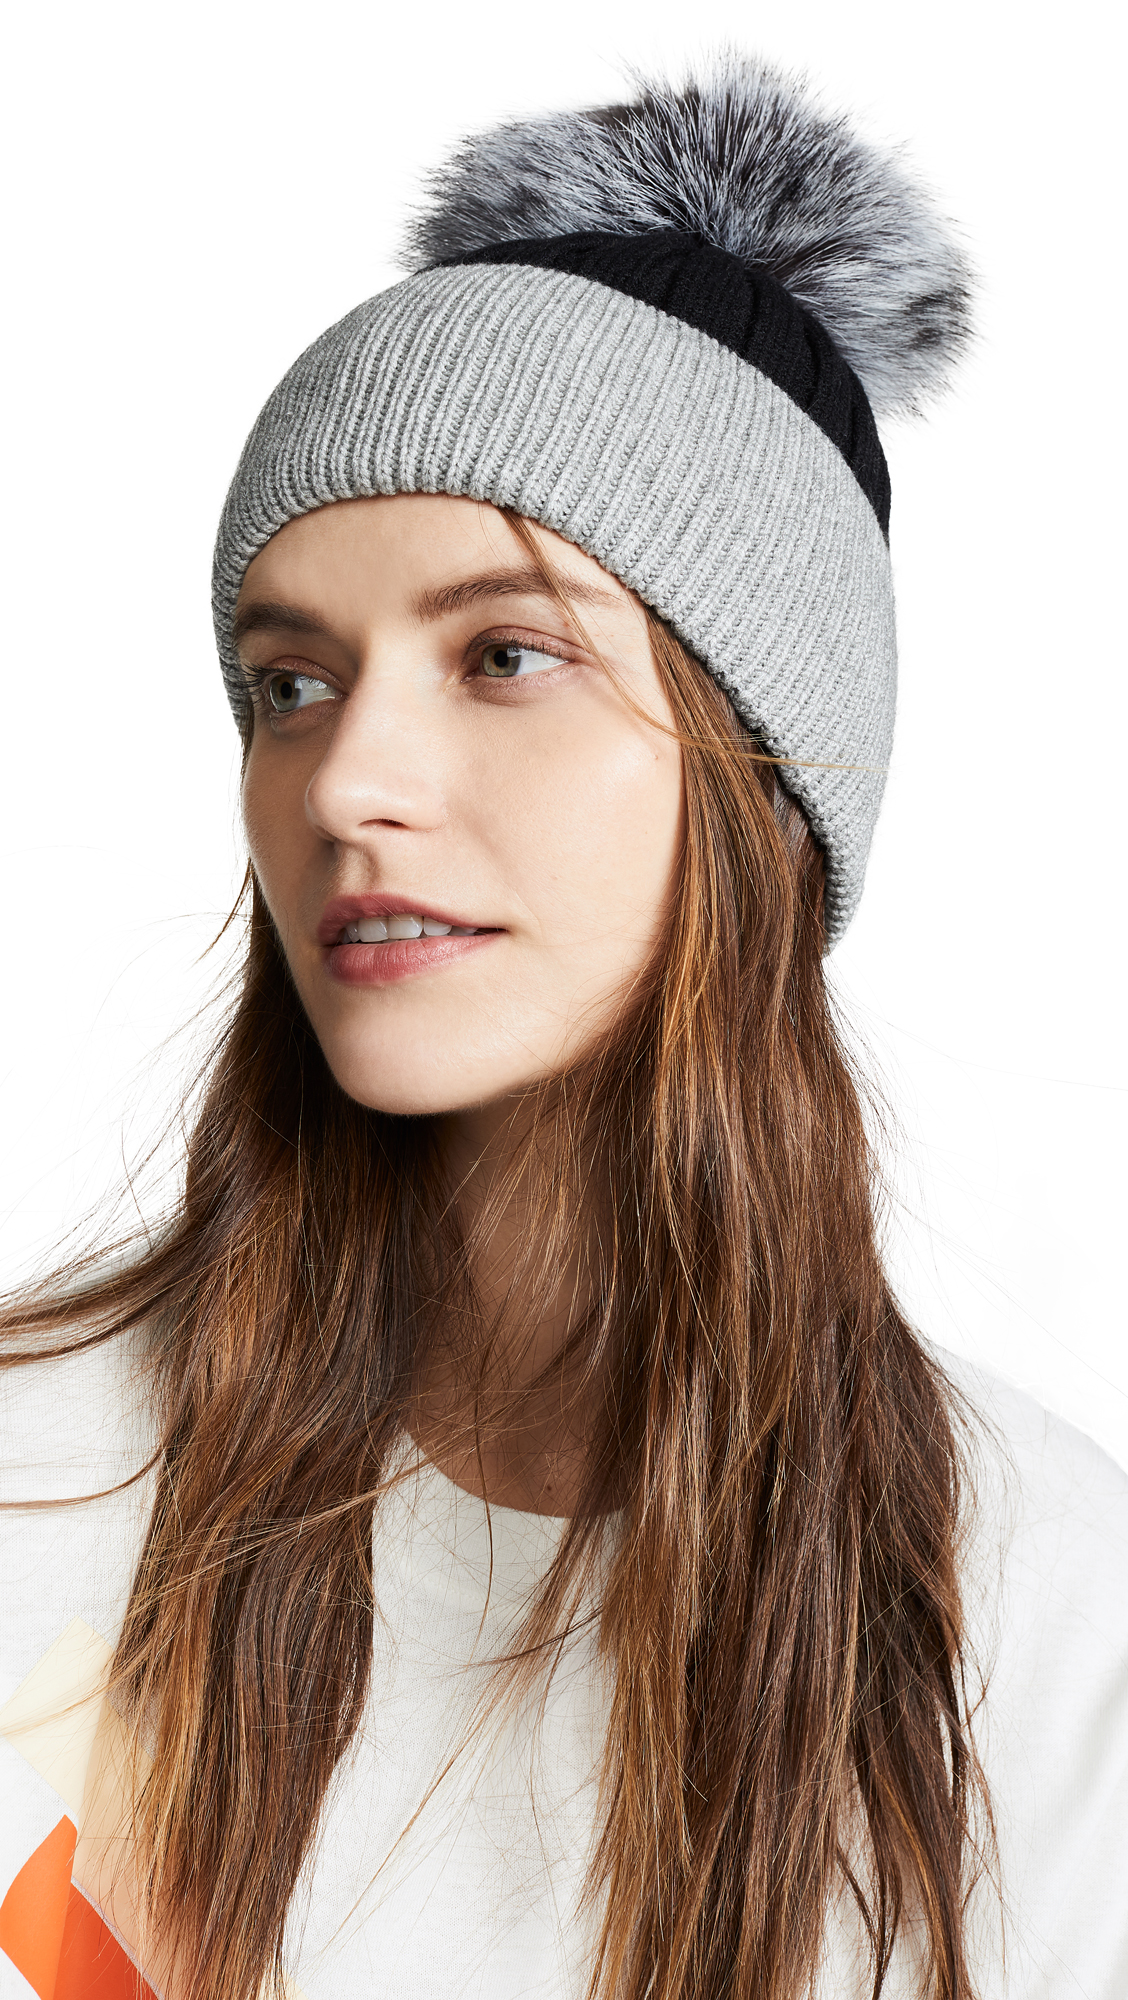 b539c75c620ed Jocelyn Knit Hat With Fur Pom In Black Grey